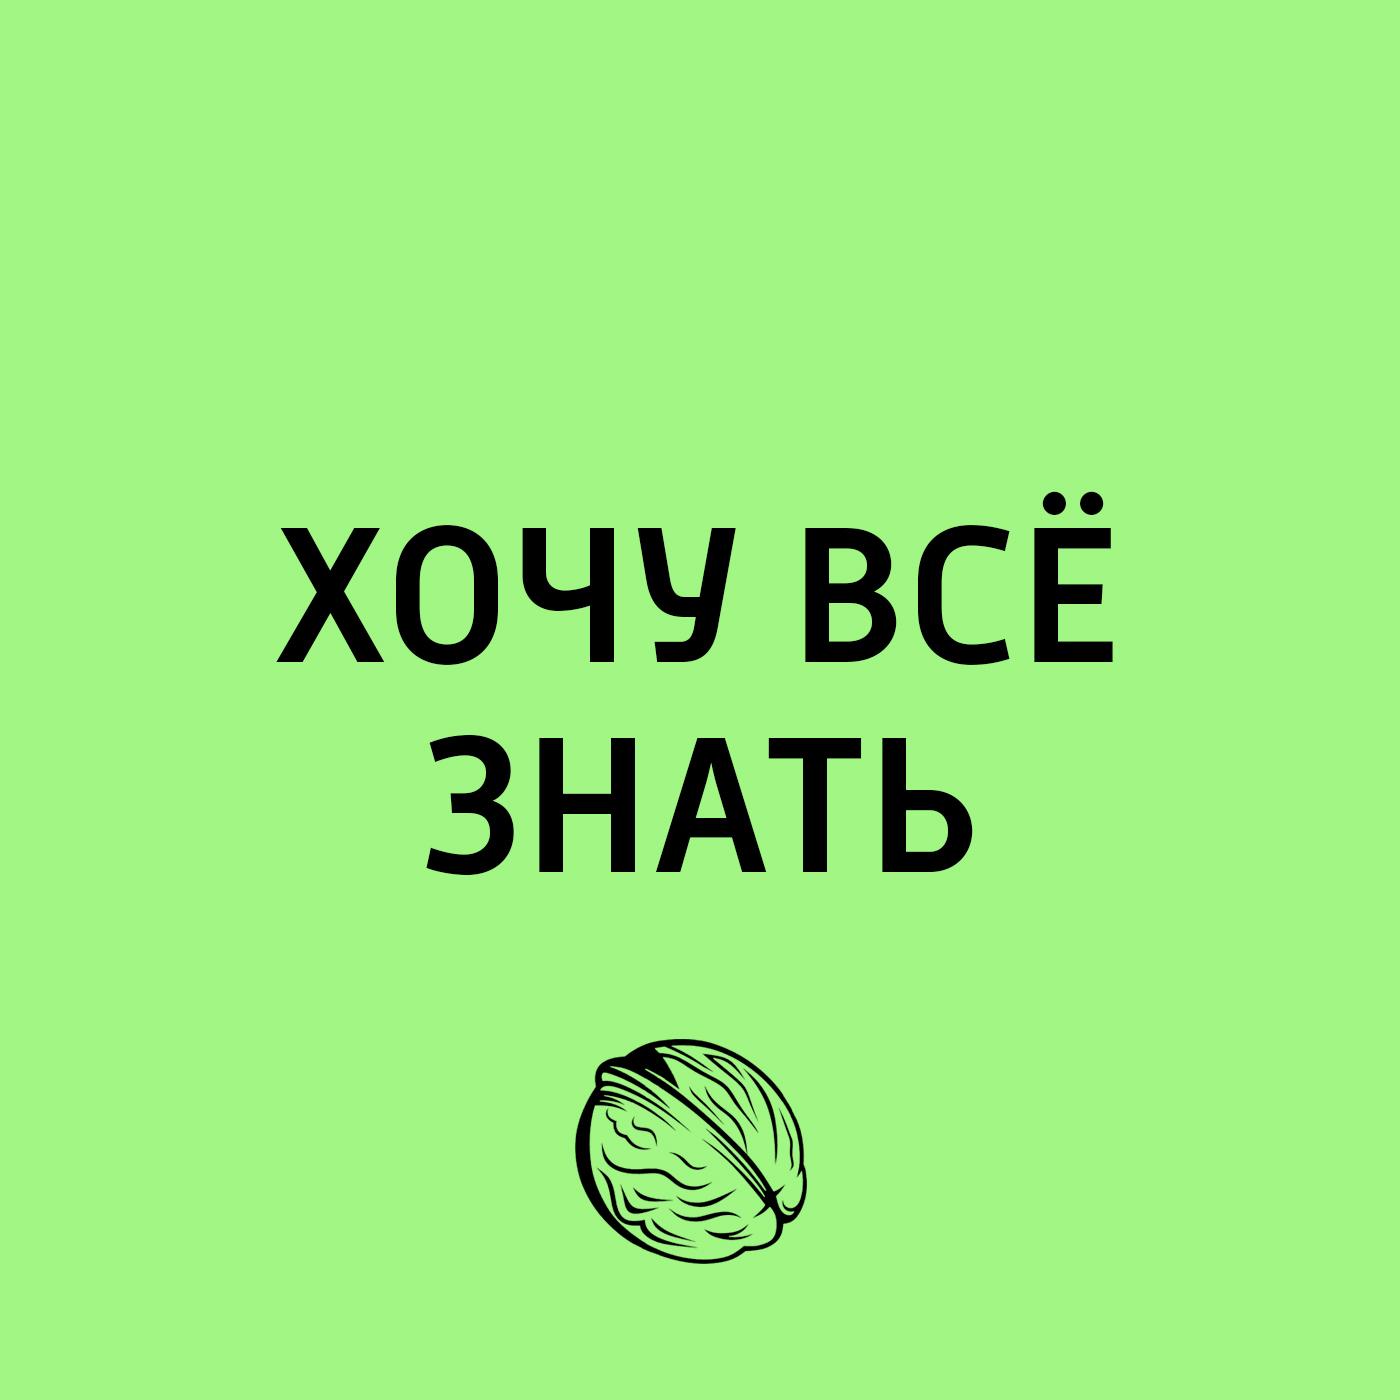 Творческий коллектив программы «Хочу всё знать» День герба и флага Москвы chery qiyun 2 флага флага комбинаций до облака тени оттенок облако star абажура цена клеить